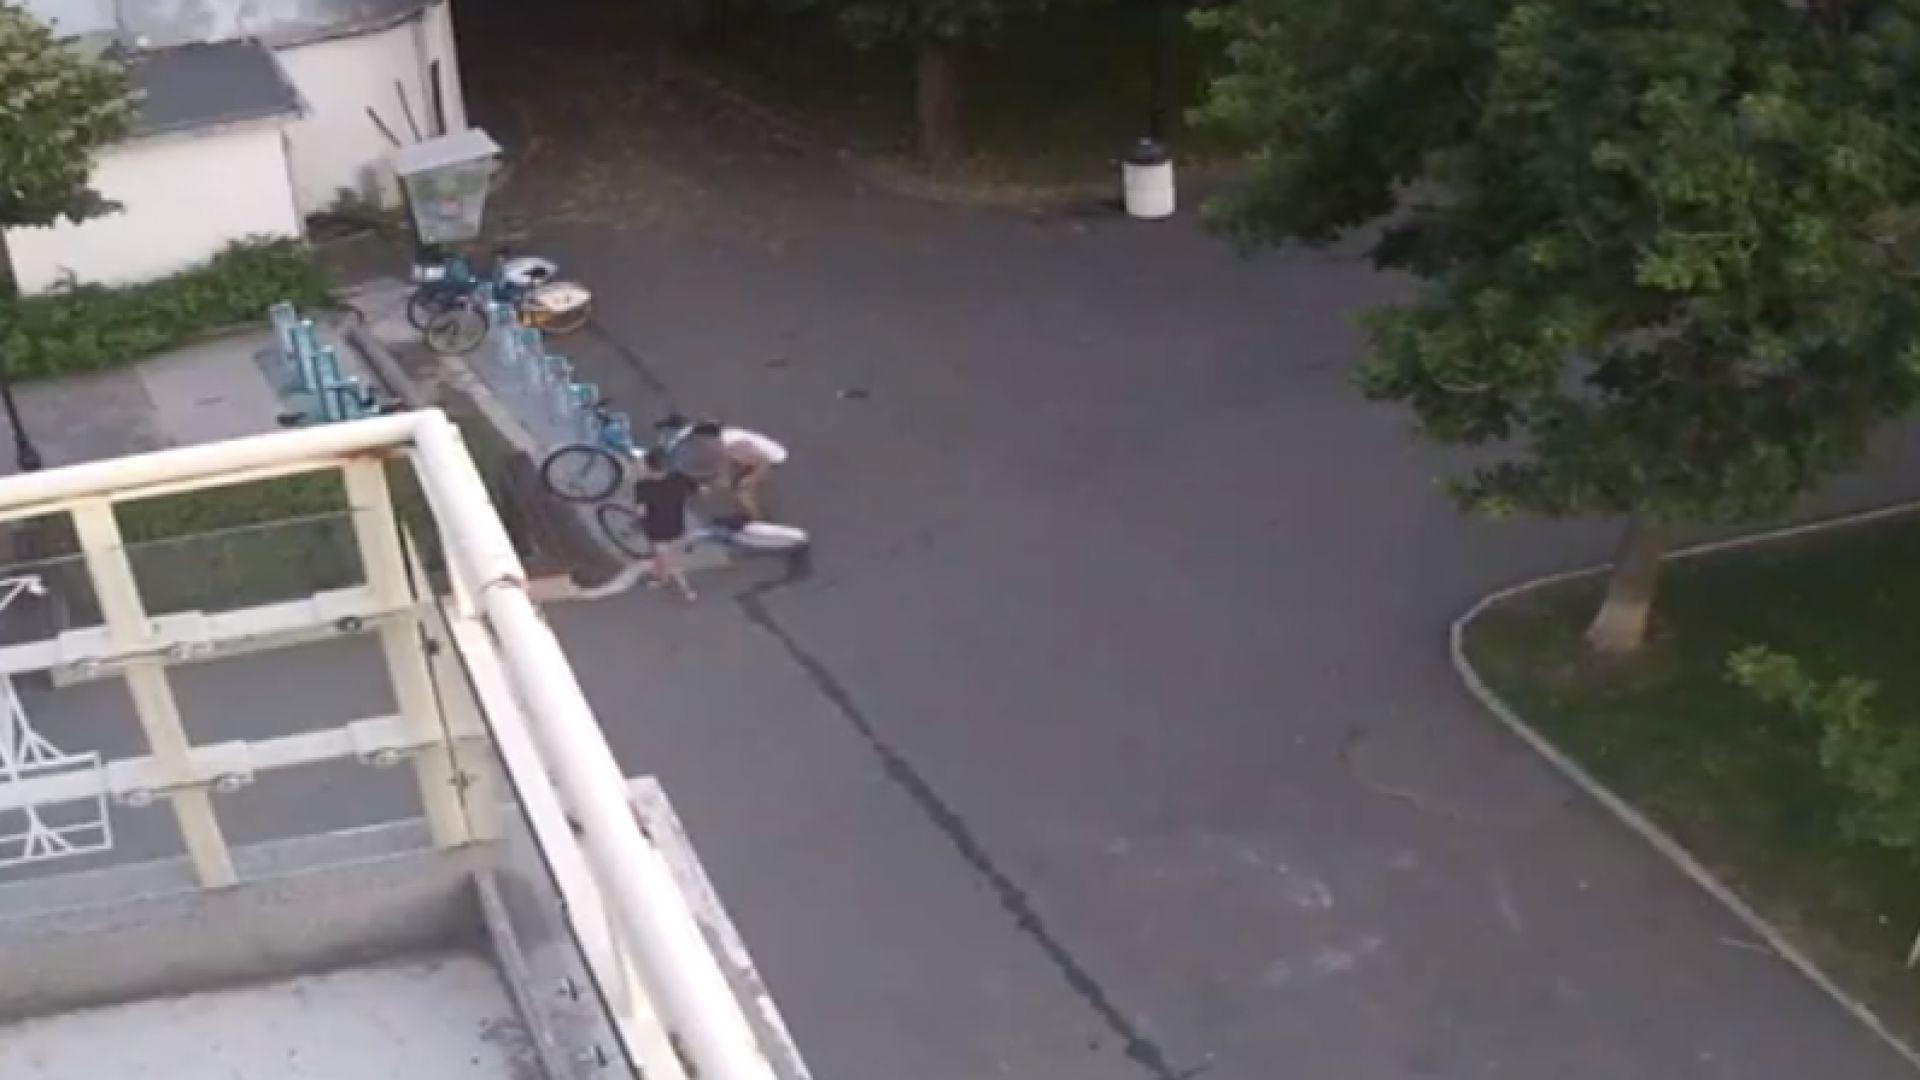 Деца вандали атакуваха велостоянка и откраднаха колело в Бургас (видео)